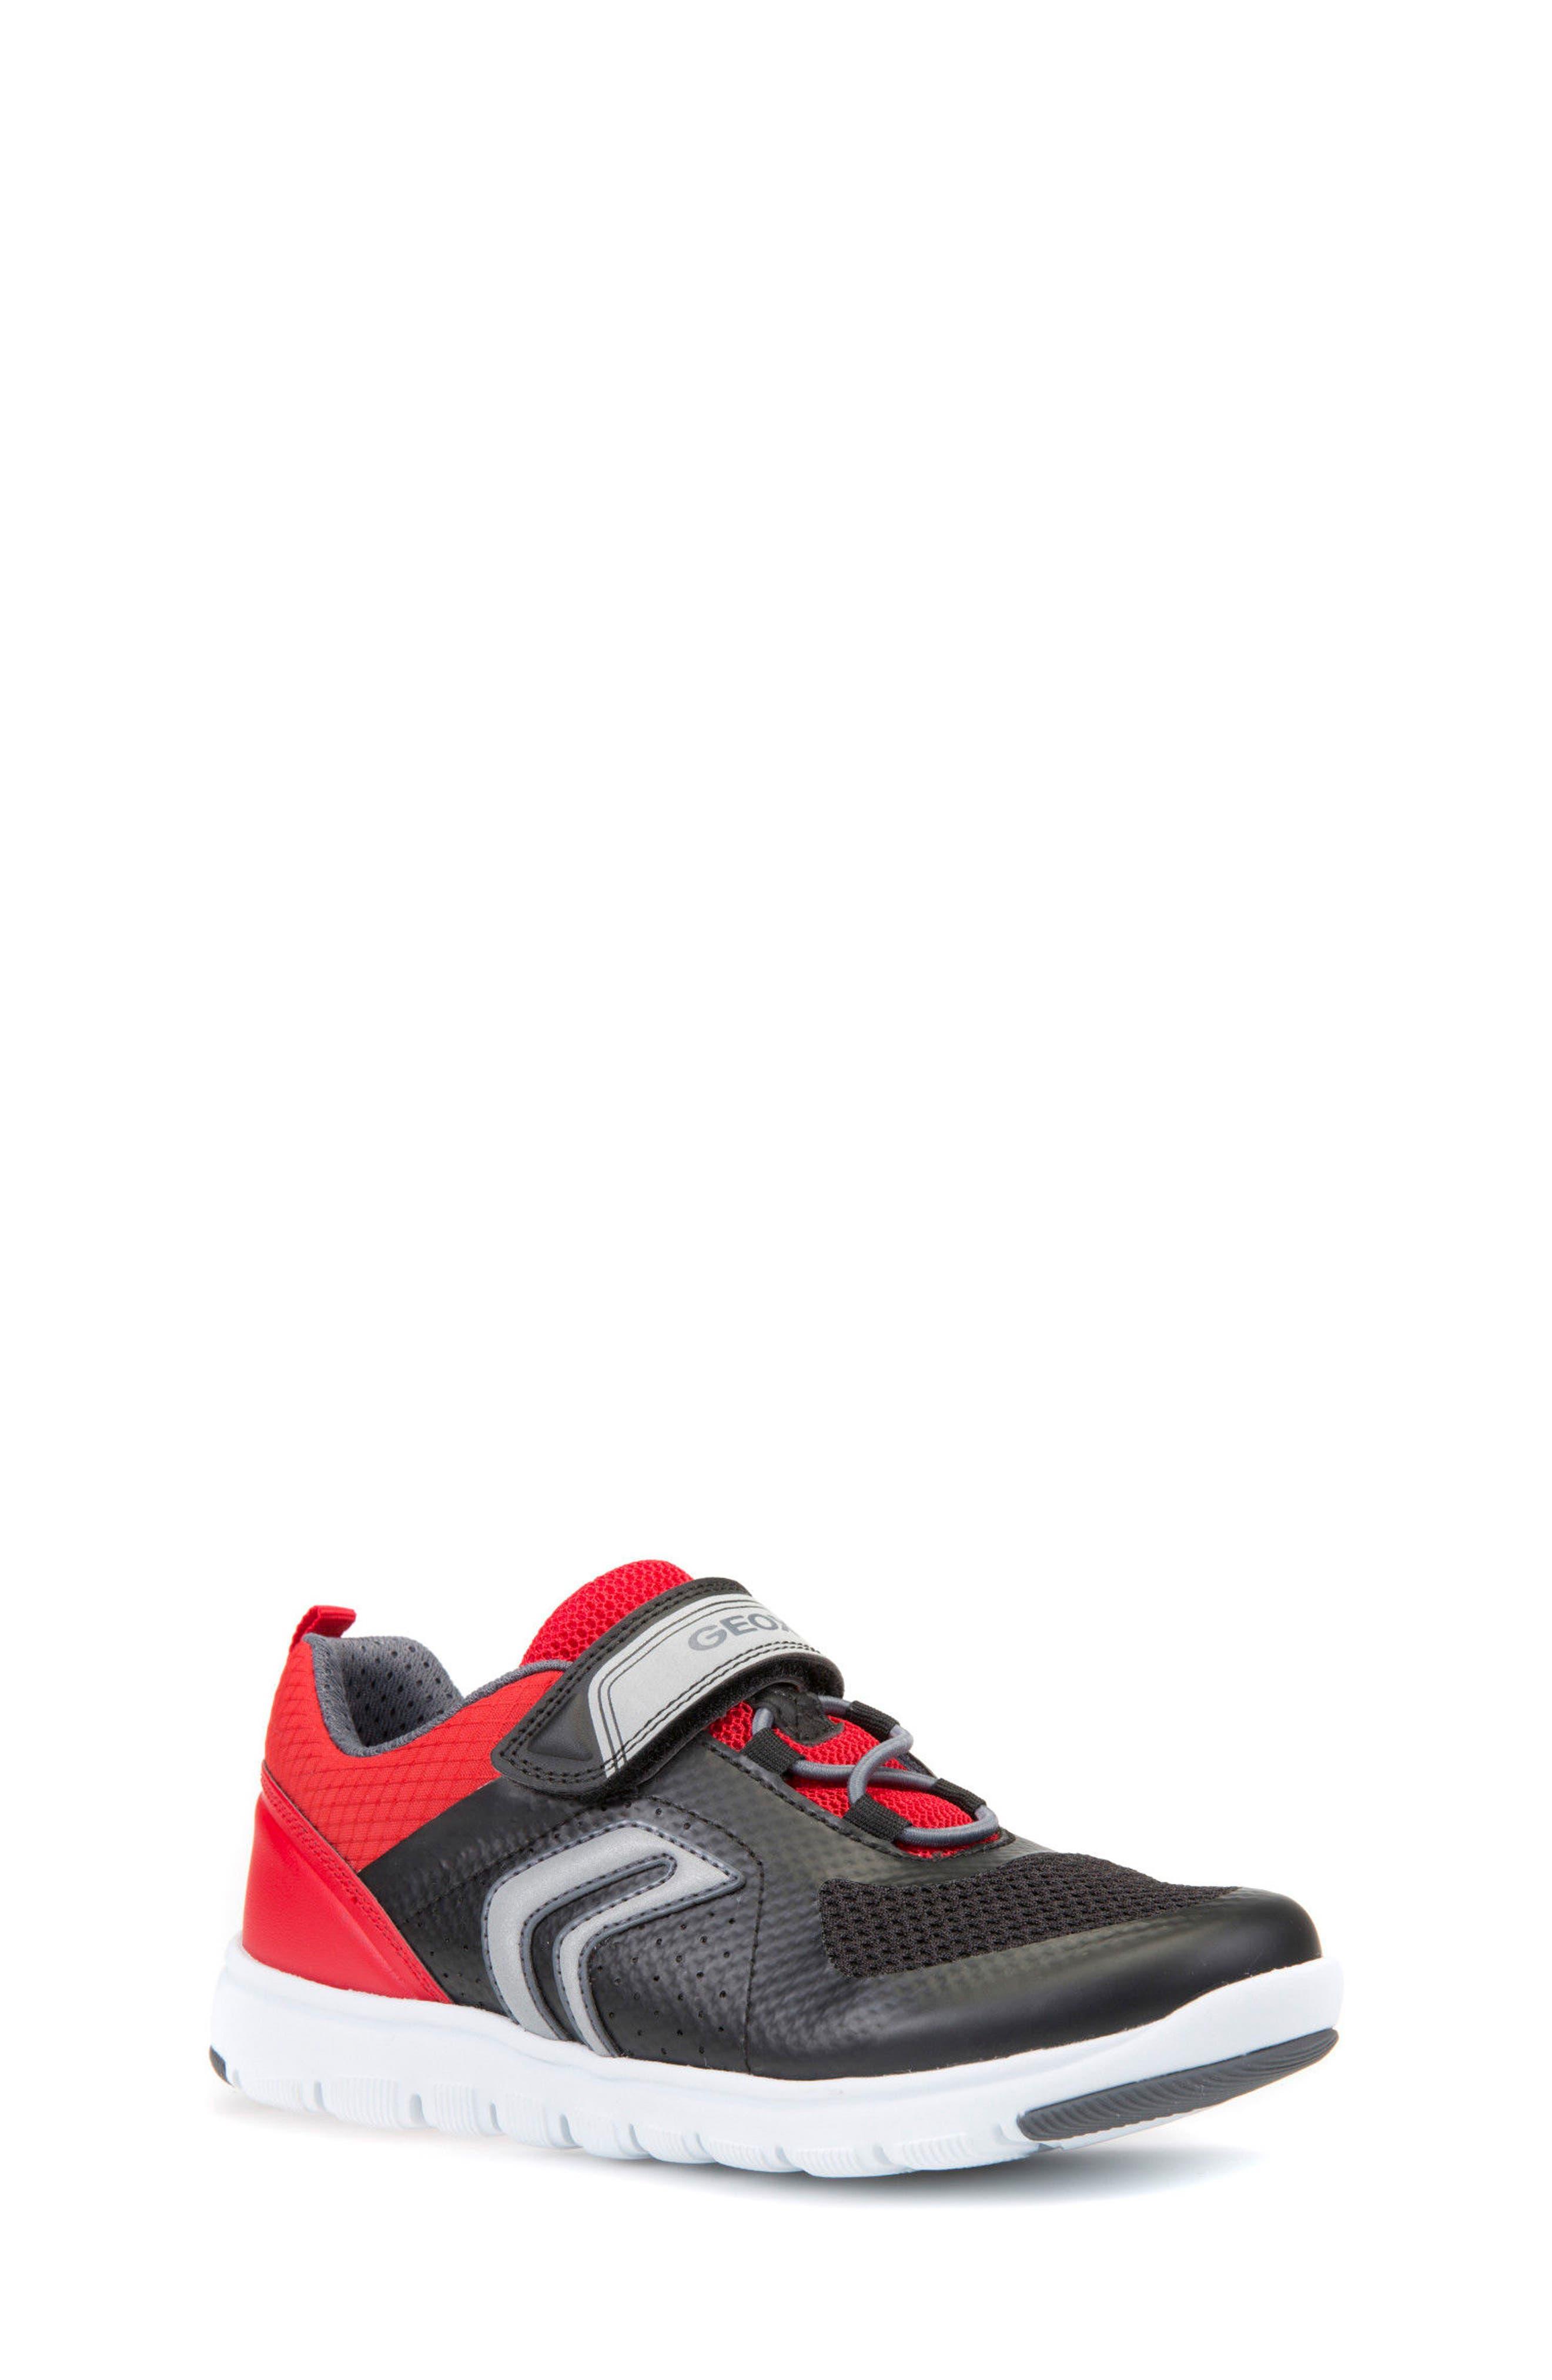 Xunday Low Top Sneaker,                         Main,                         color, 001